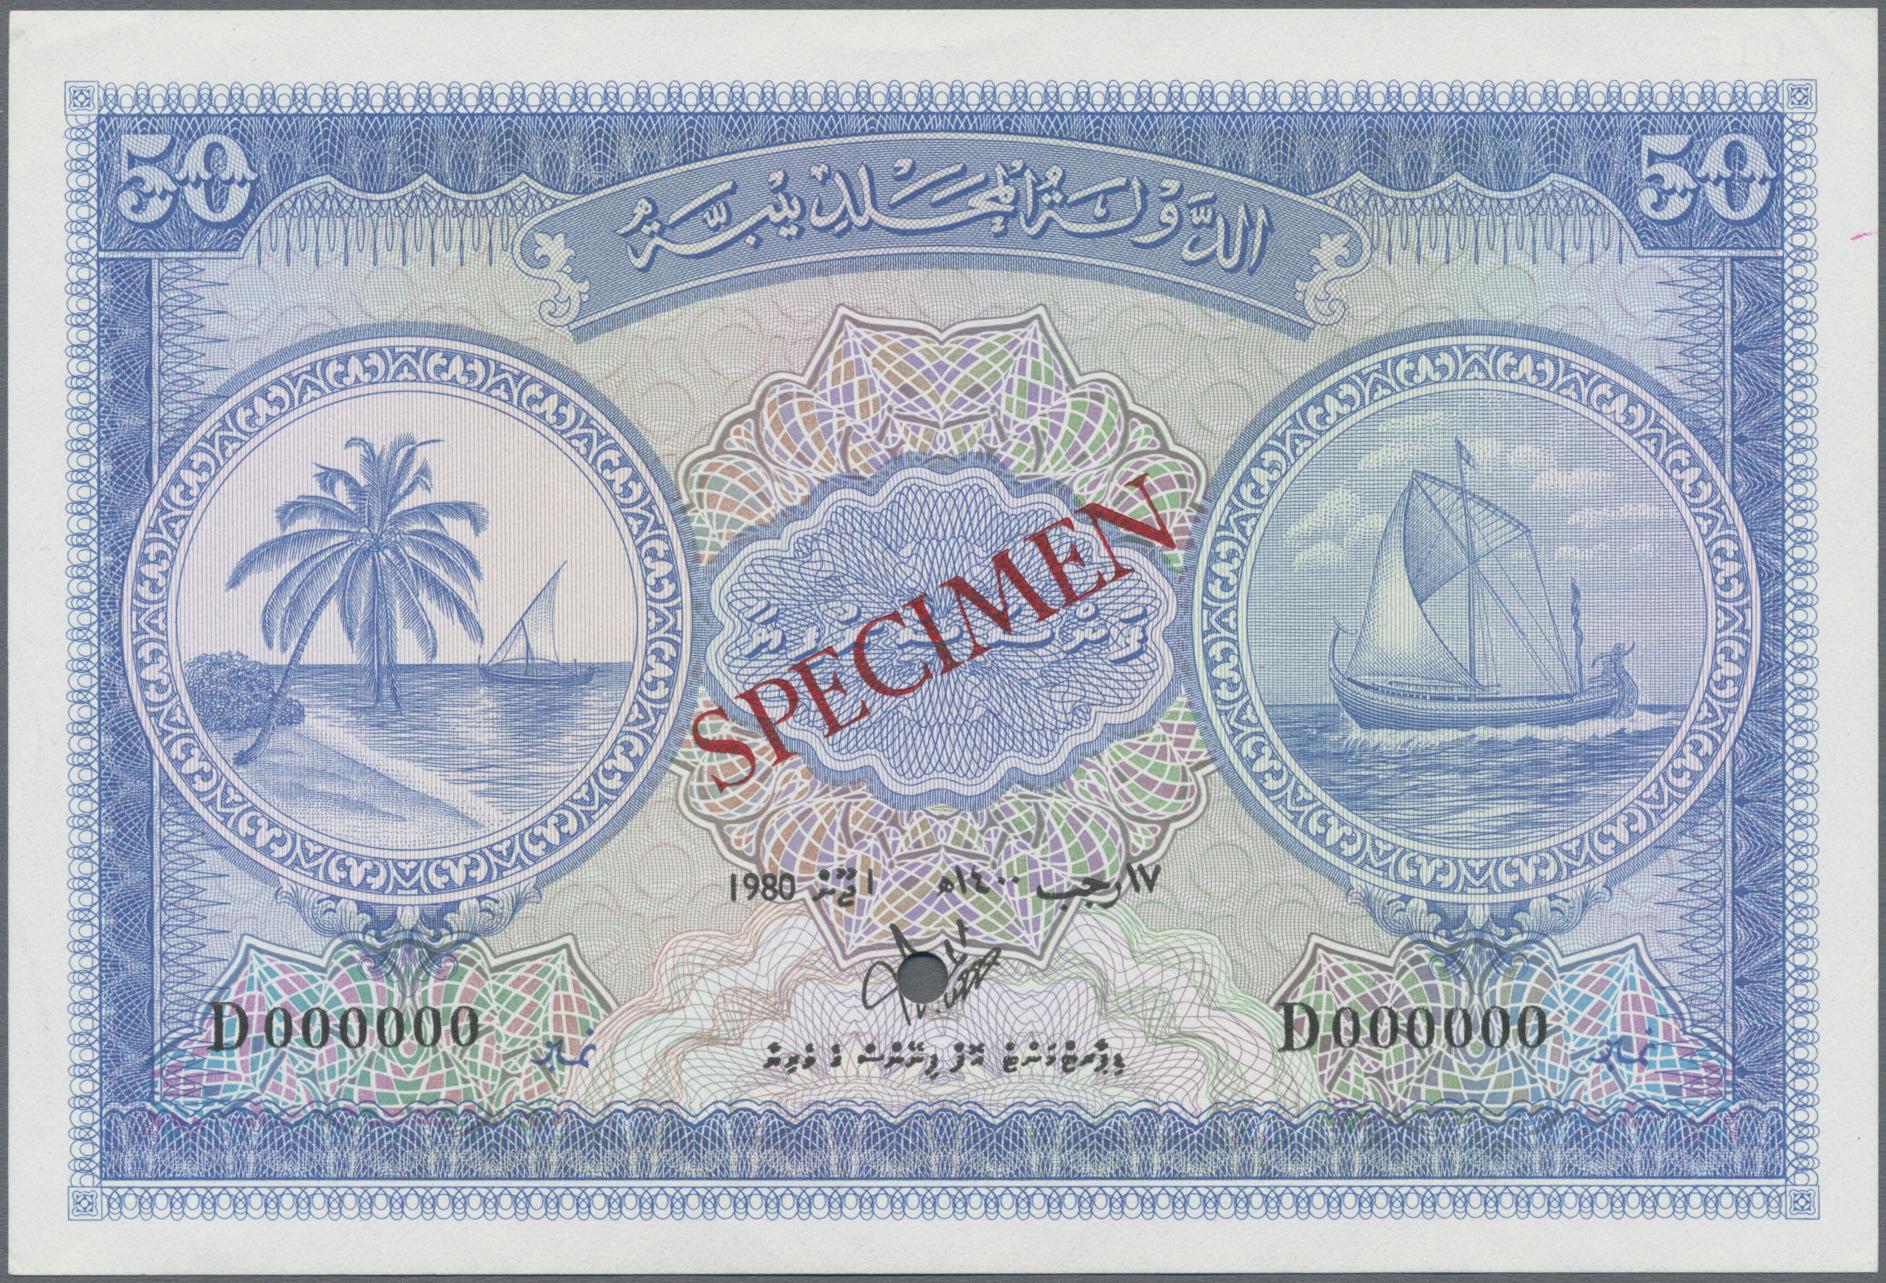 Lot 00514 - Maldives / Malediven   Banknoten  -  Auktionshaus Christoph Gärtner GmbH & Co. KG Sale #48 The Banknotes